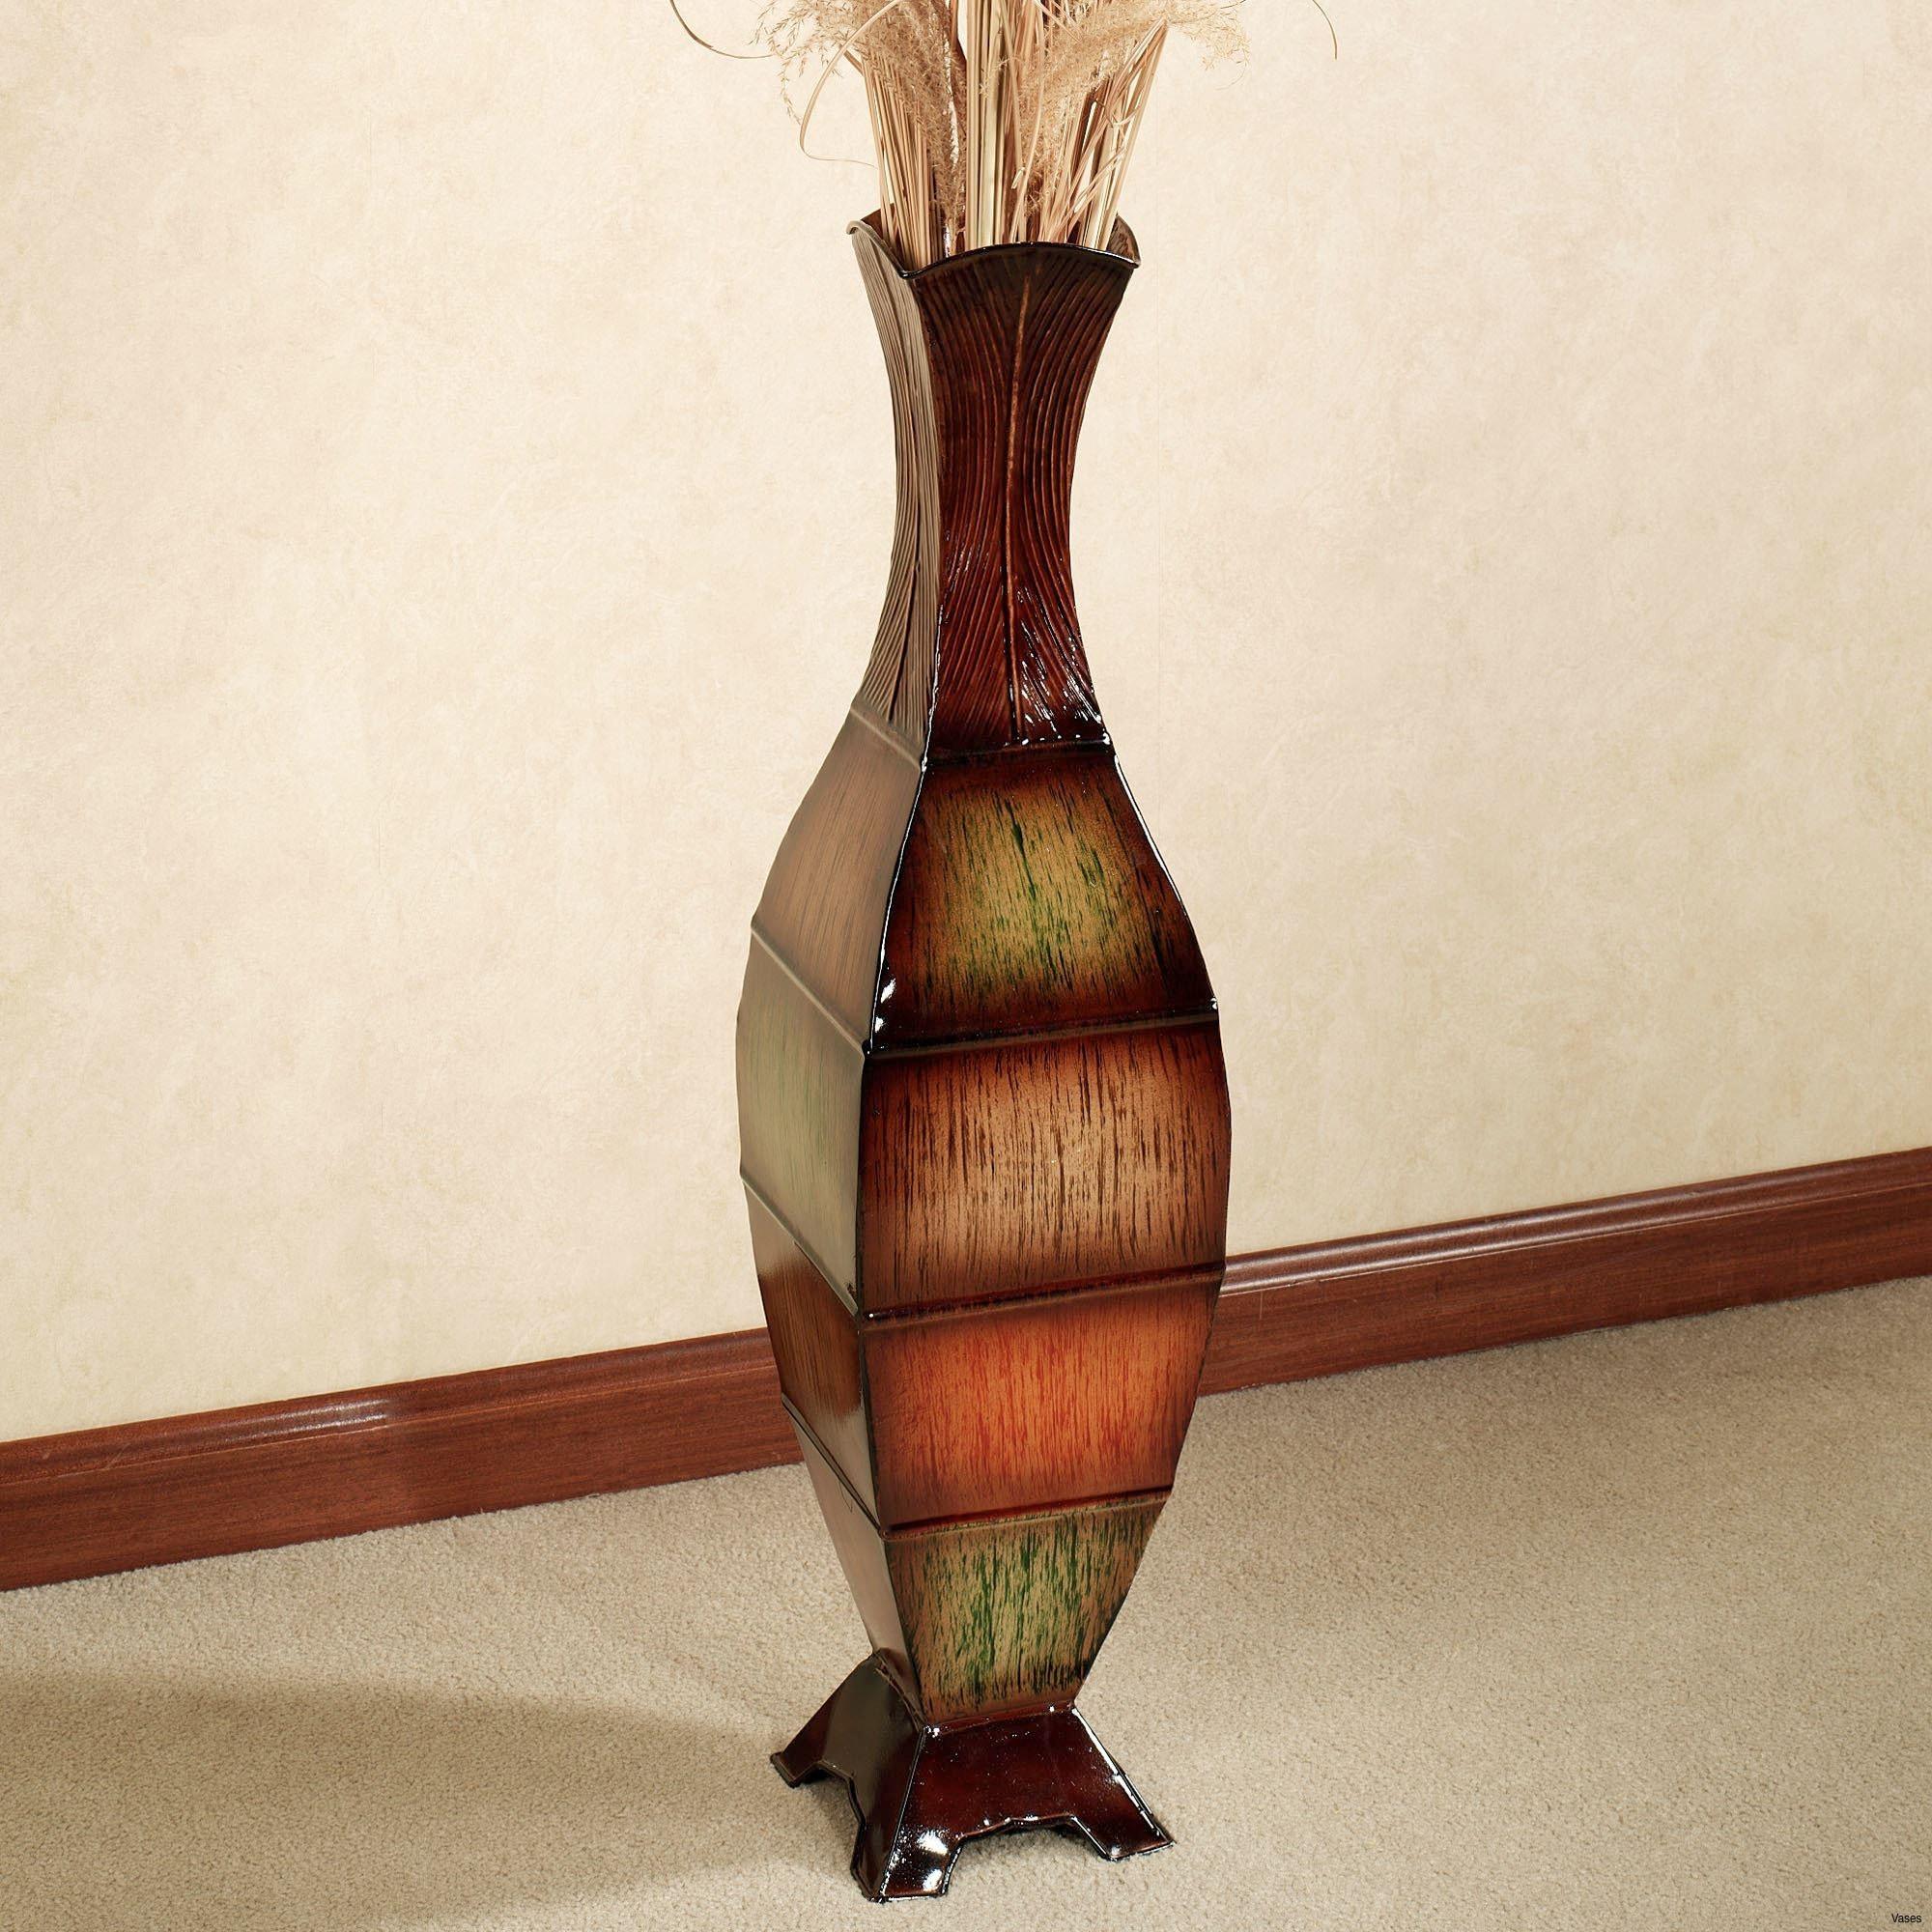 21 Fashionable Cheap Oversized Floor Vases Decorative Vase Ideas